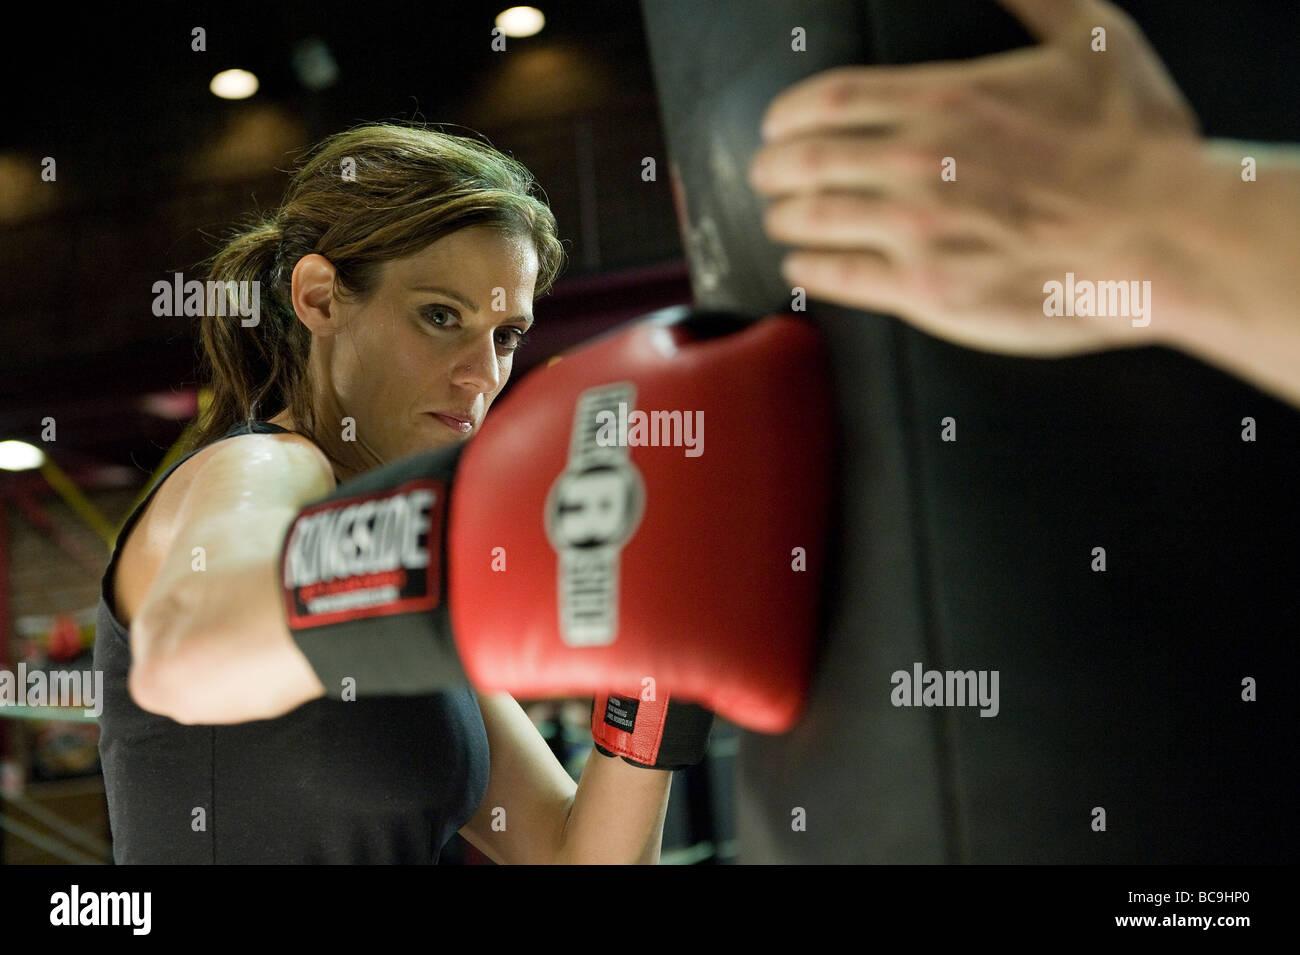 Female boxer training at the gym - Stock Image